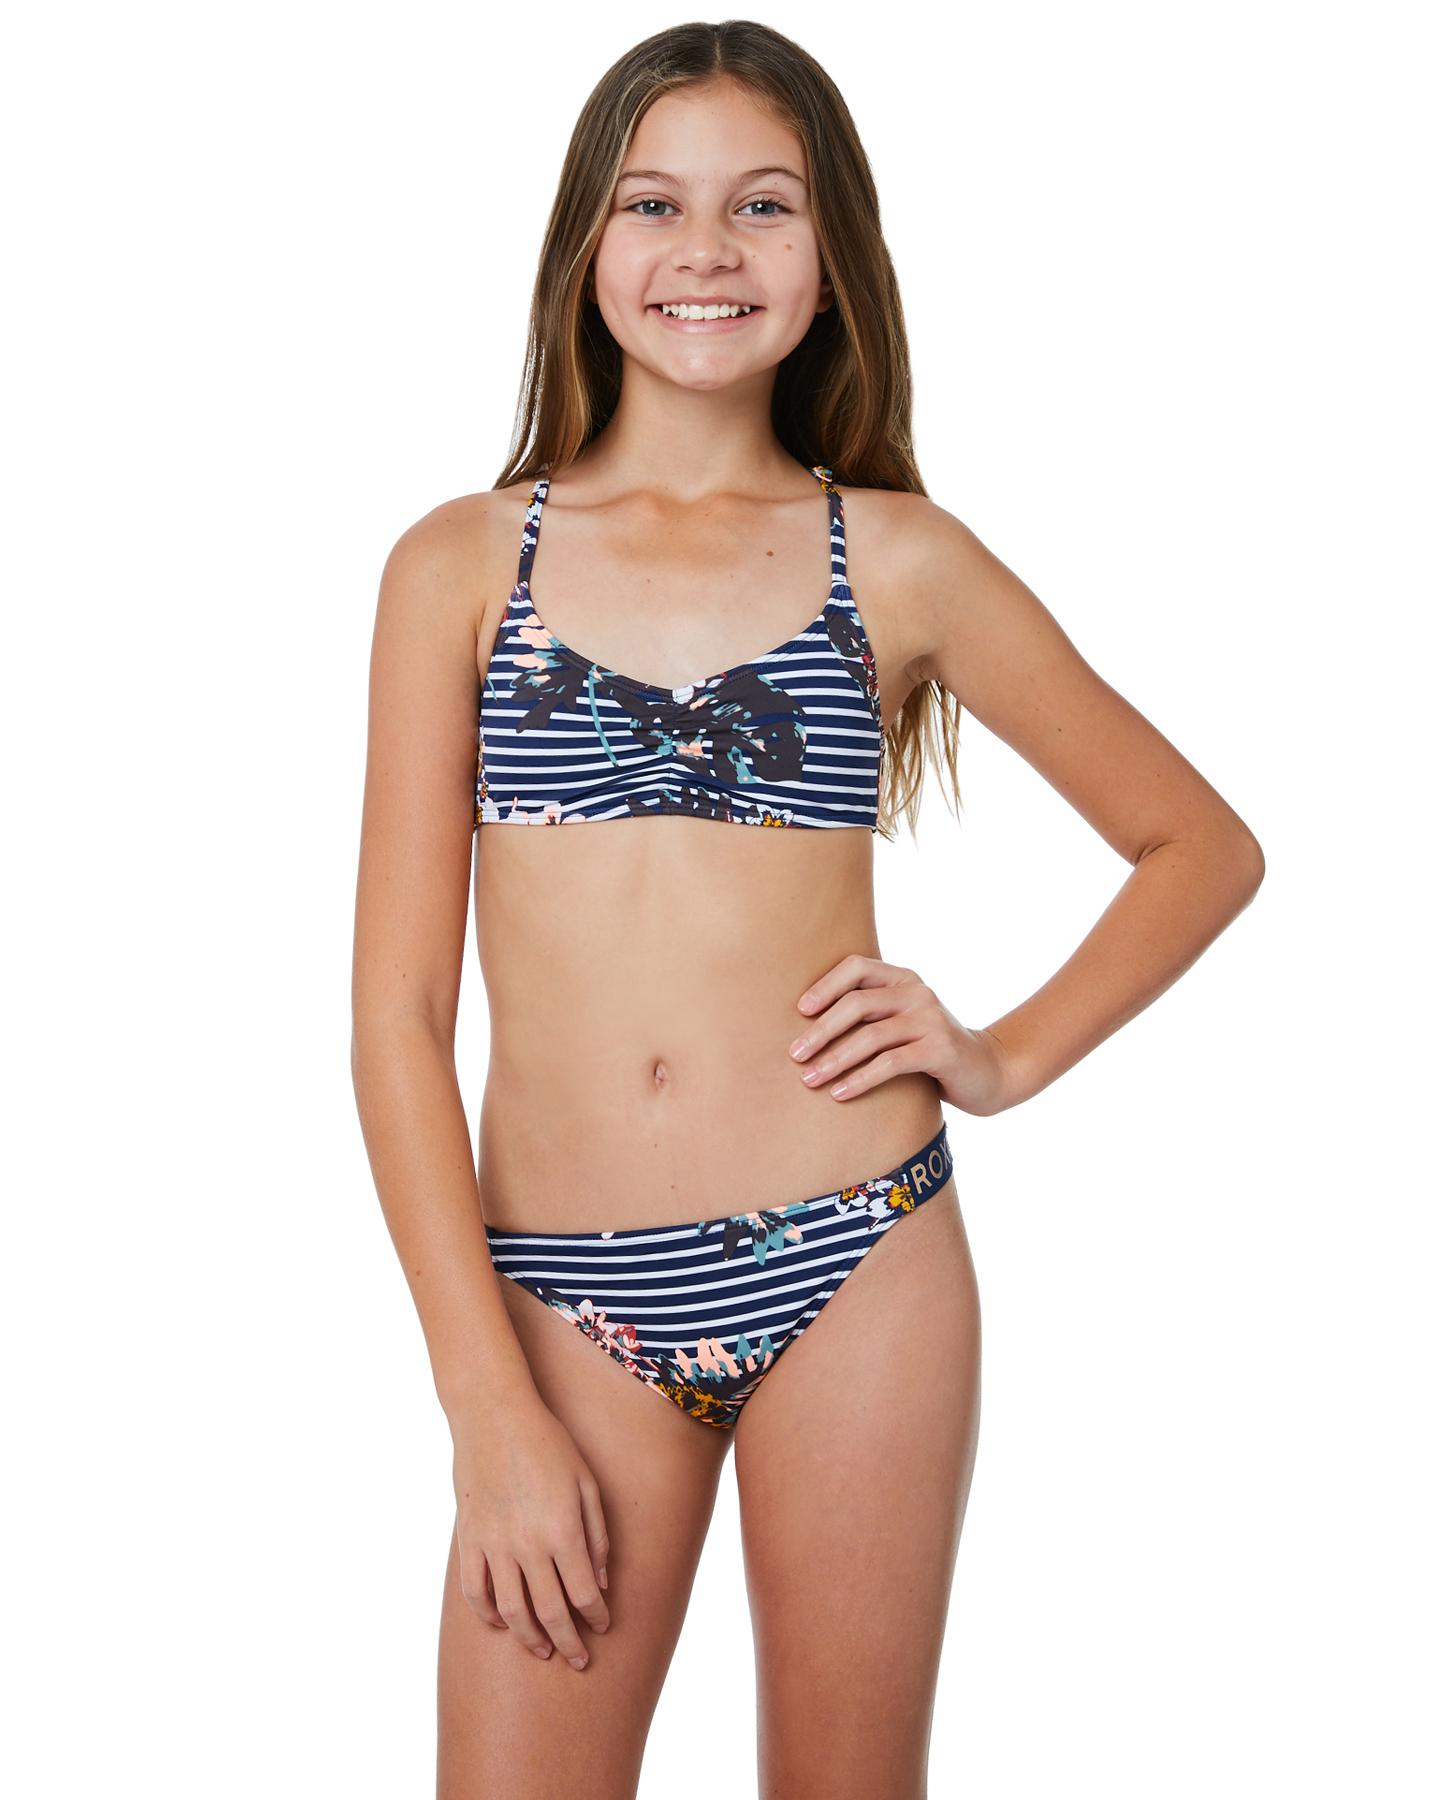 on sale 42f46 93afa Roxy Keep In Flow Athletic Bikini Set - Medieval Blue Bdwalk ...